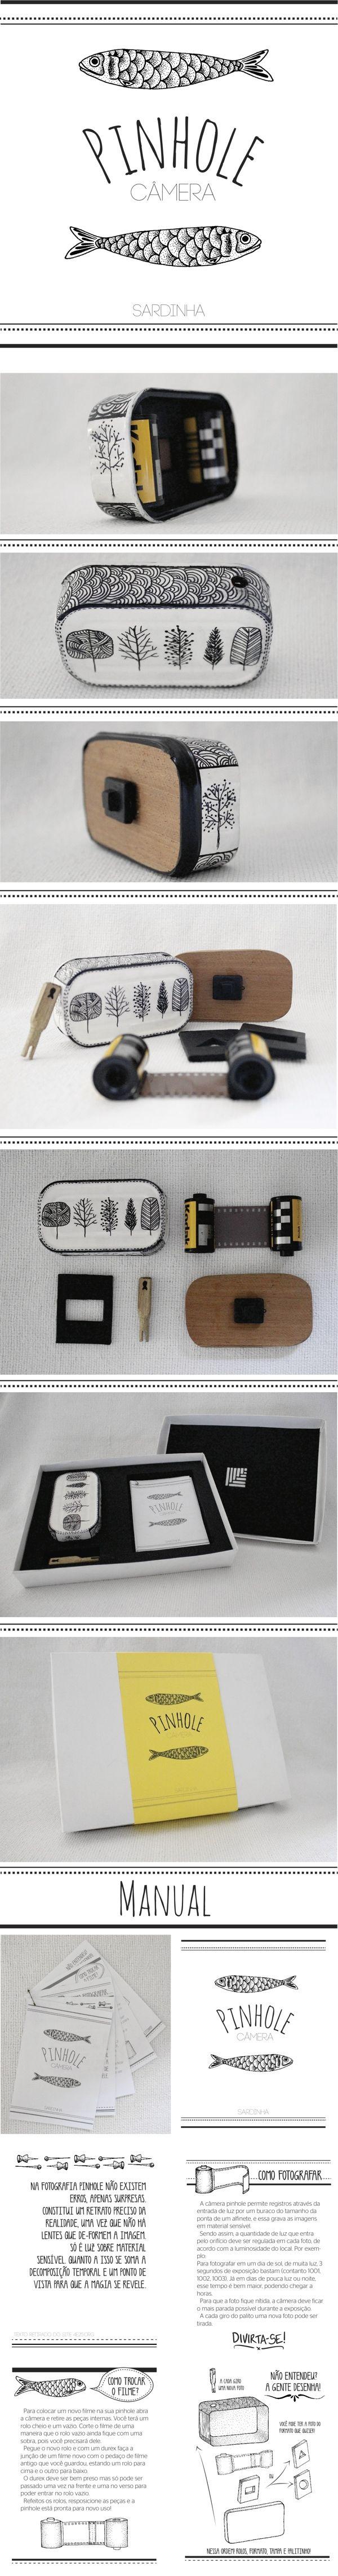 38 Best Pinhole Images On Pinterest Camera Pinhole Camera And